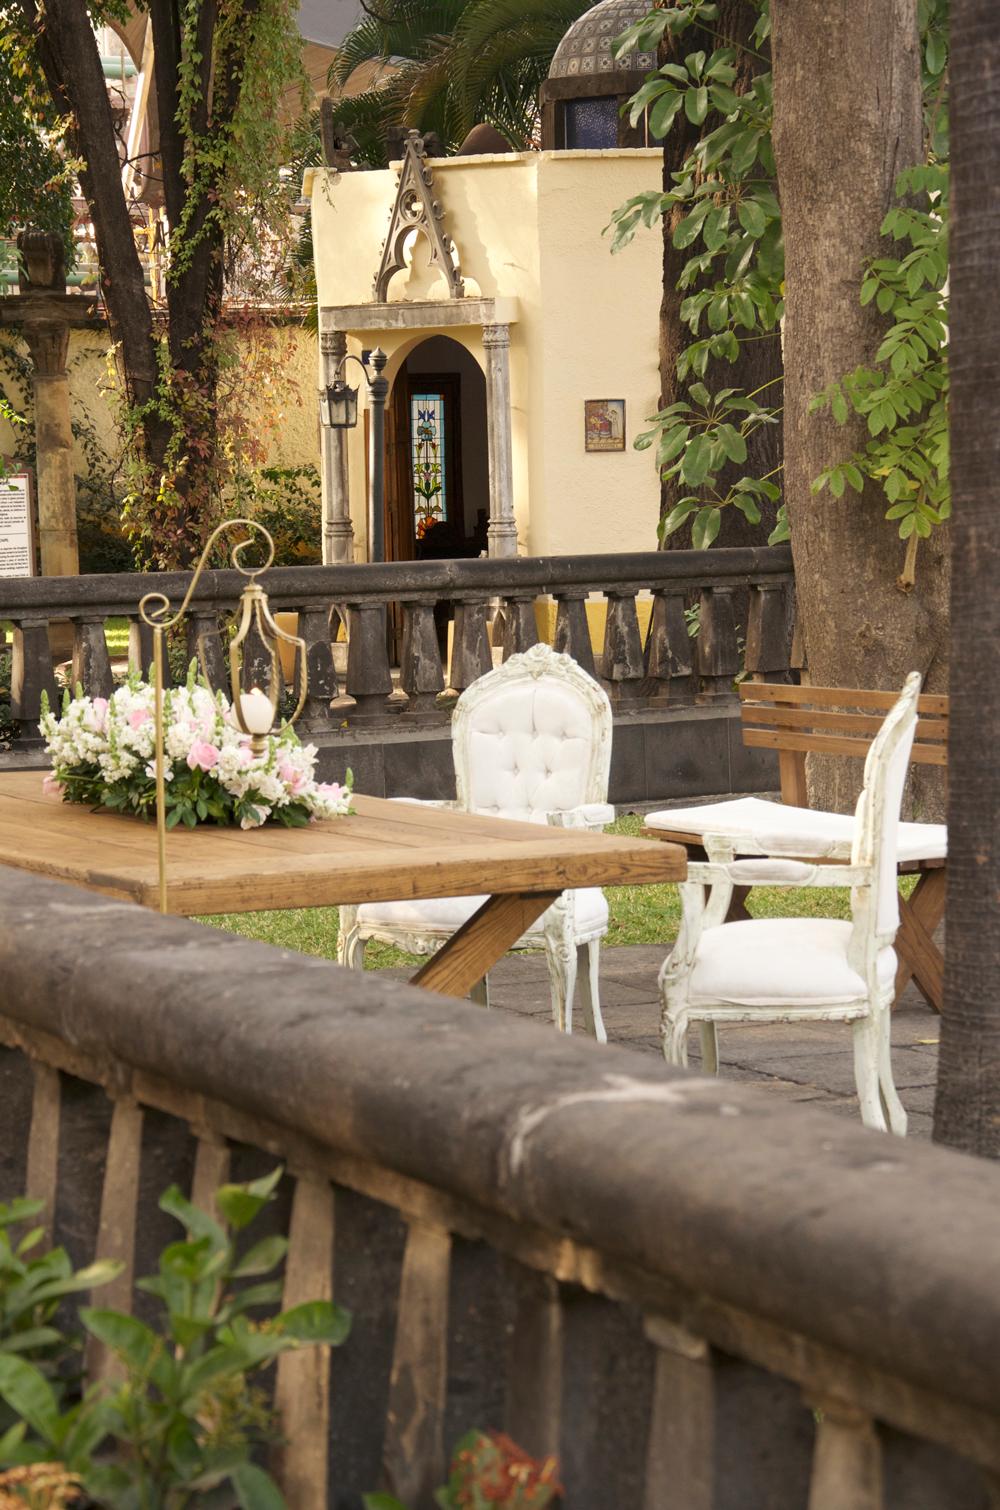 Boda-en-Casa-Sauza-arreglo-floral-con-capilla-al-fondo.png